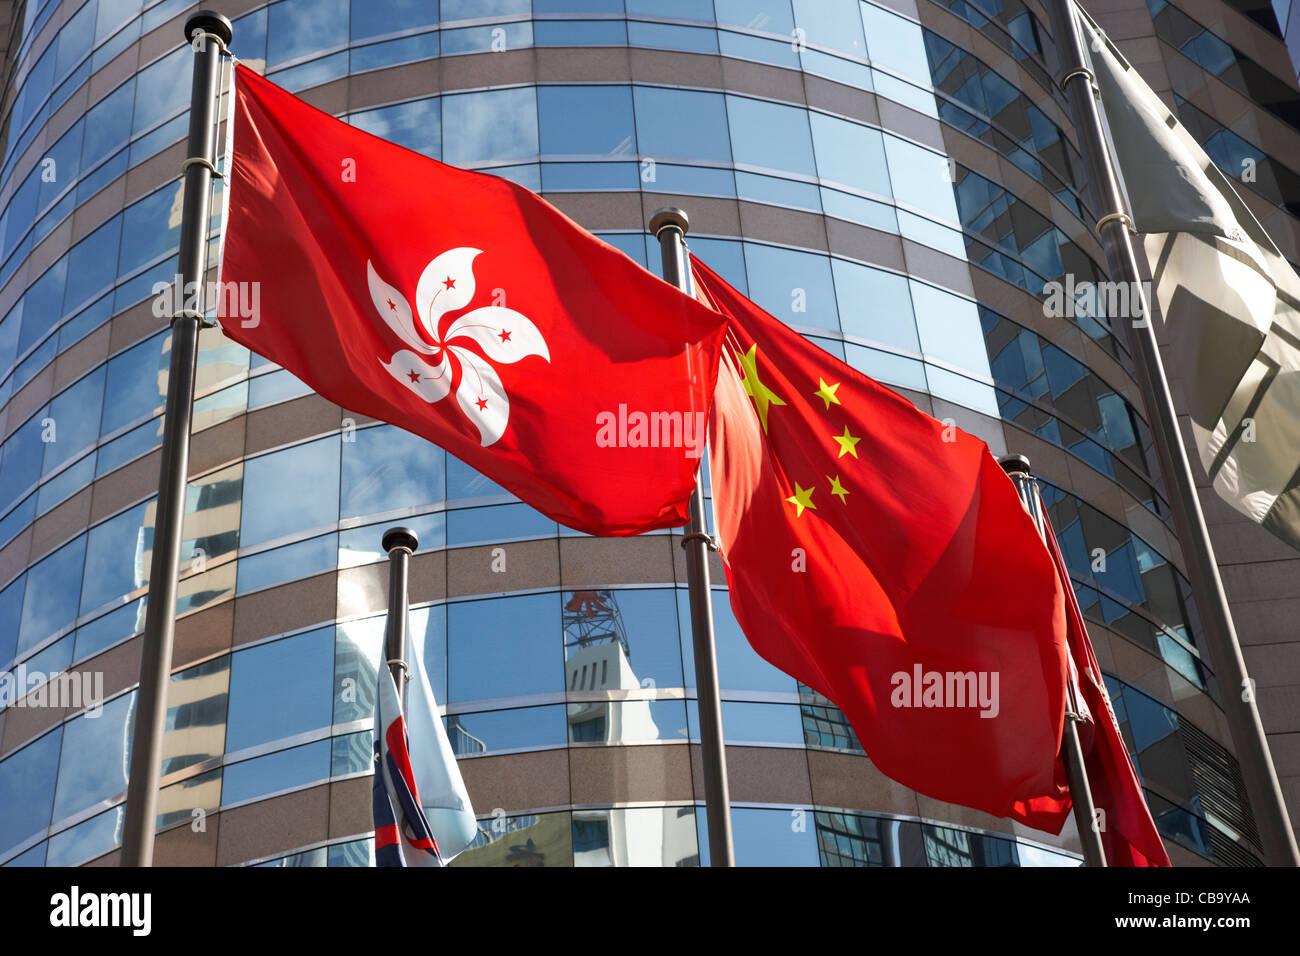 chinese and hong kong flags flying in front of stock exchange building hong kong hksar china - Stock Image